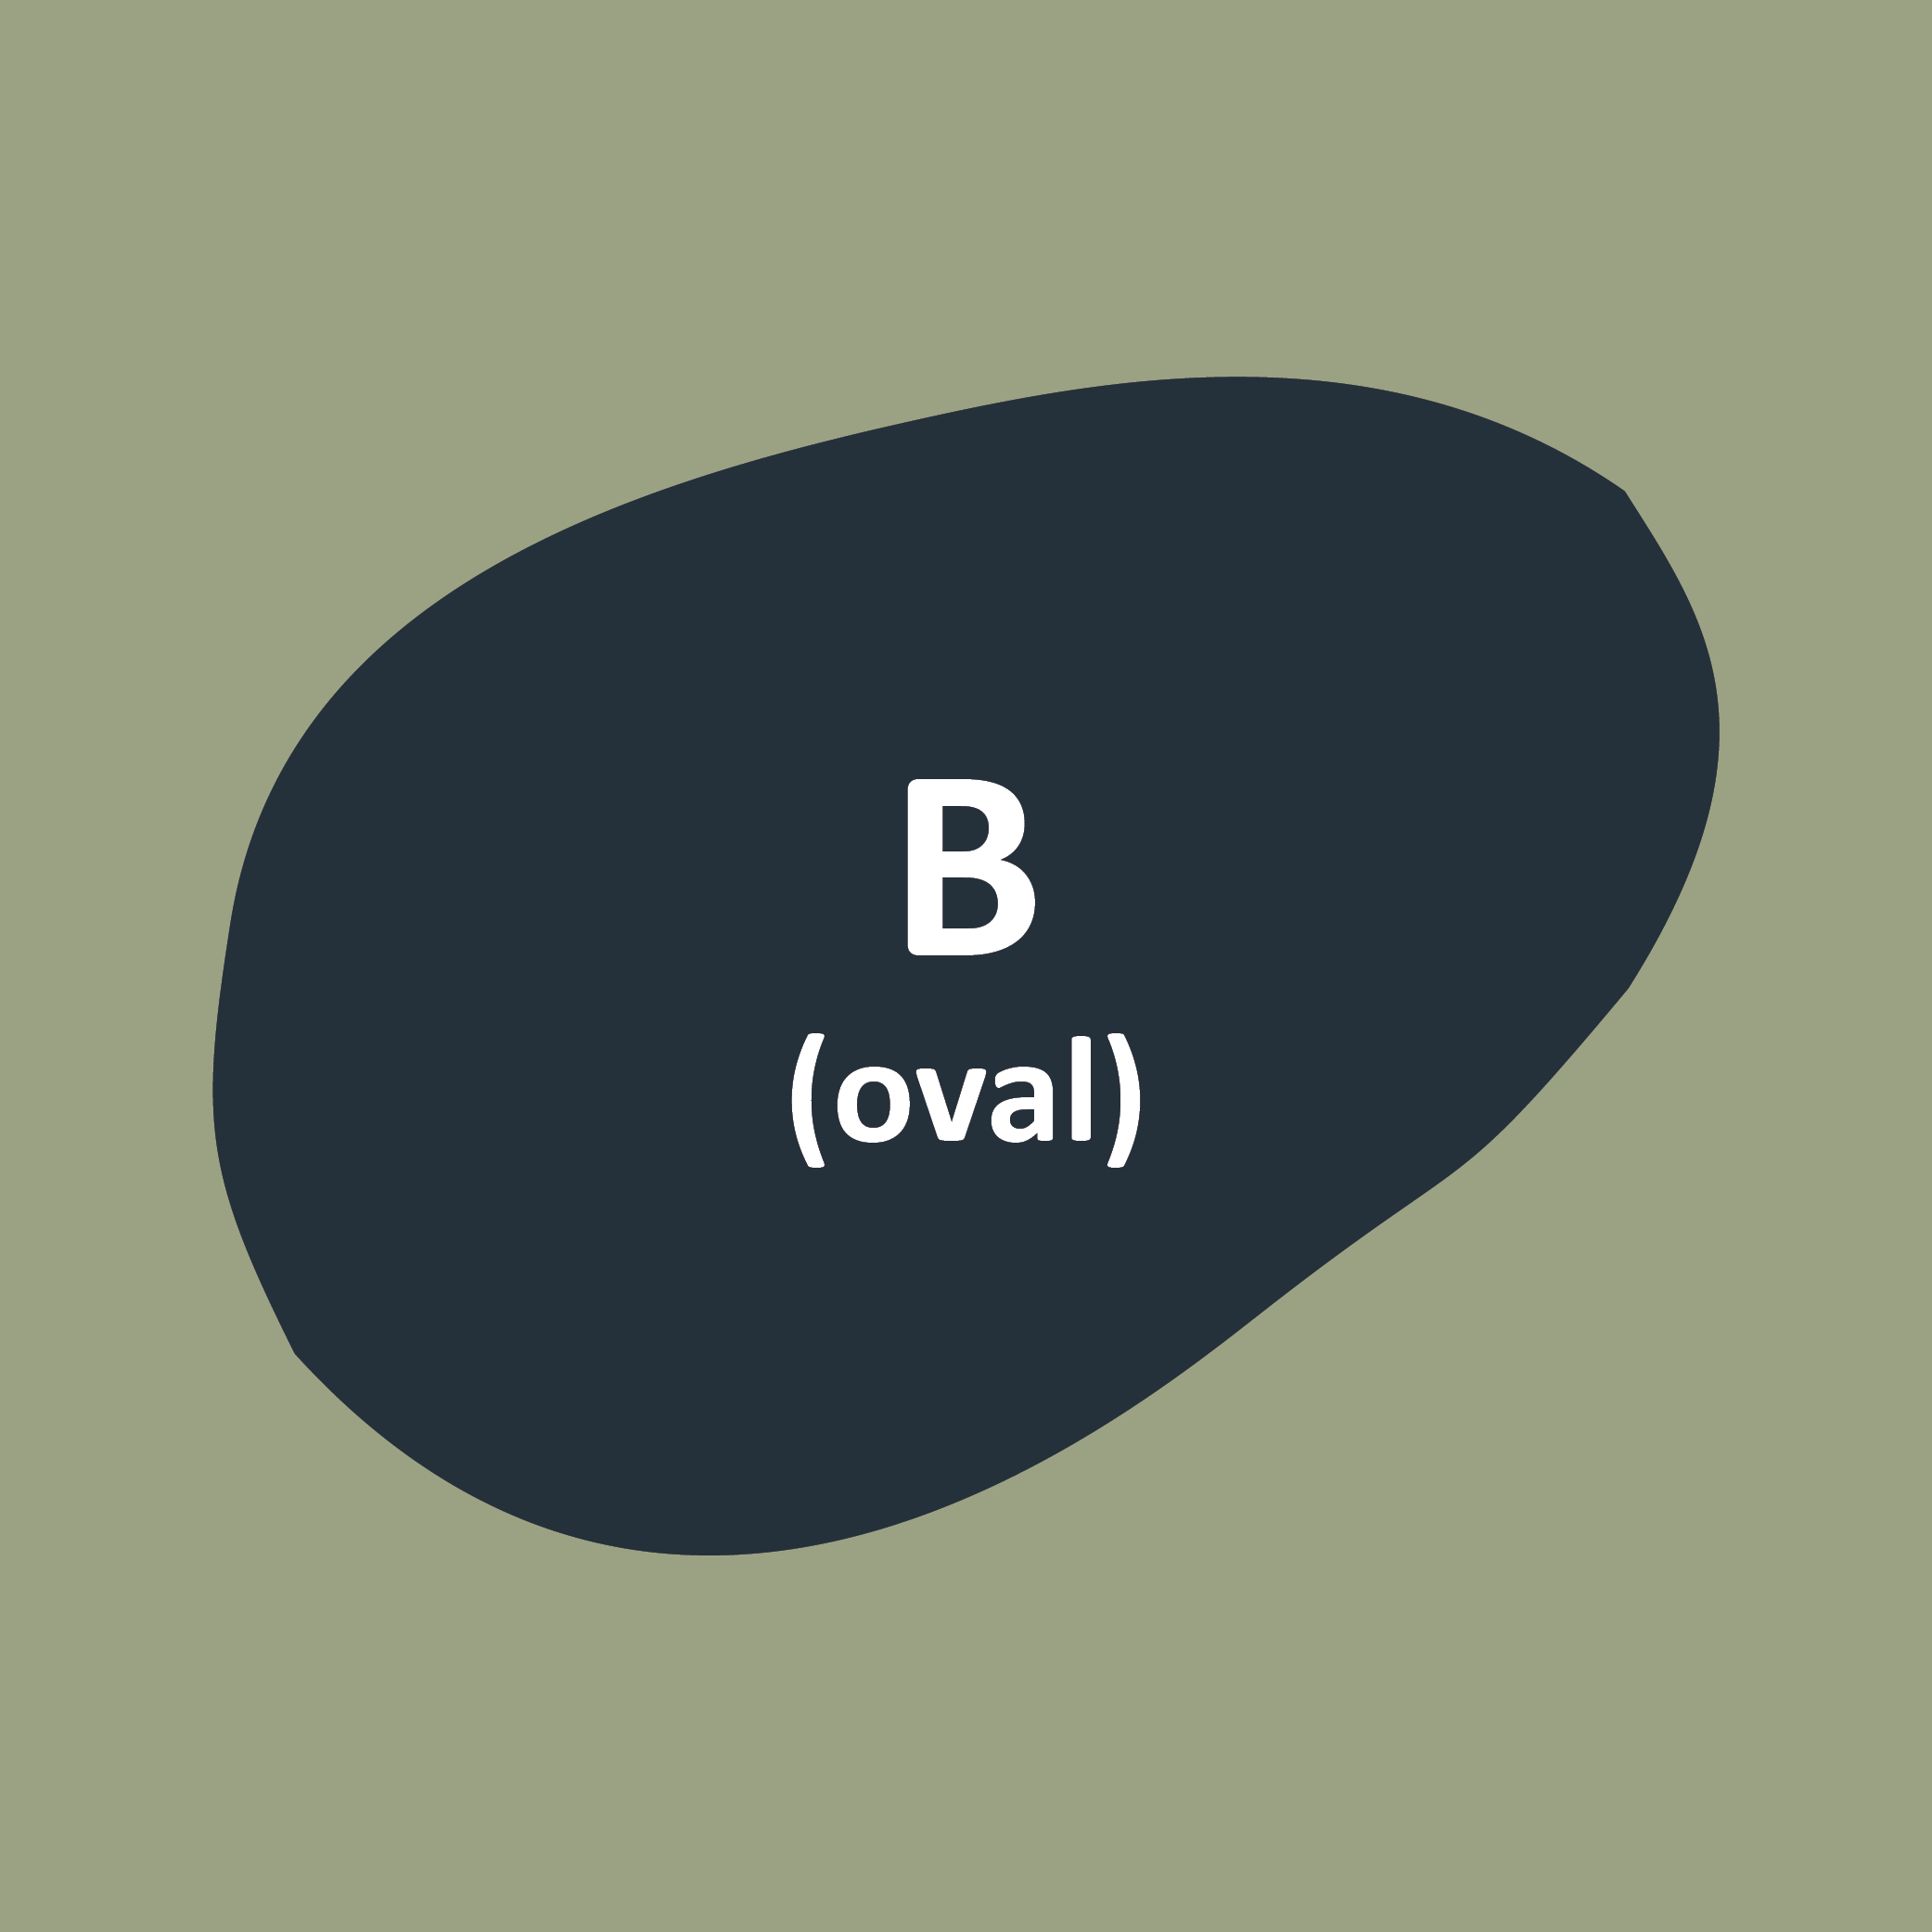 Form_oval.jpg